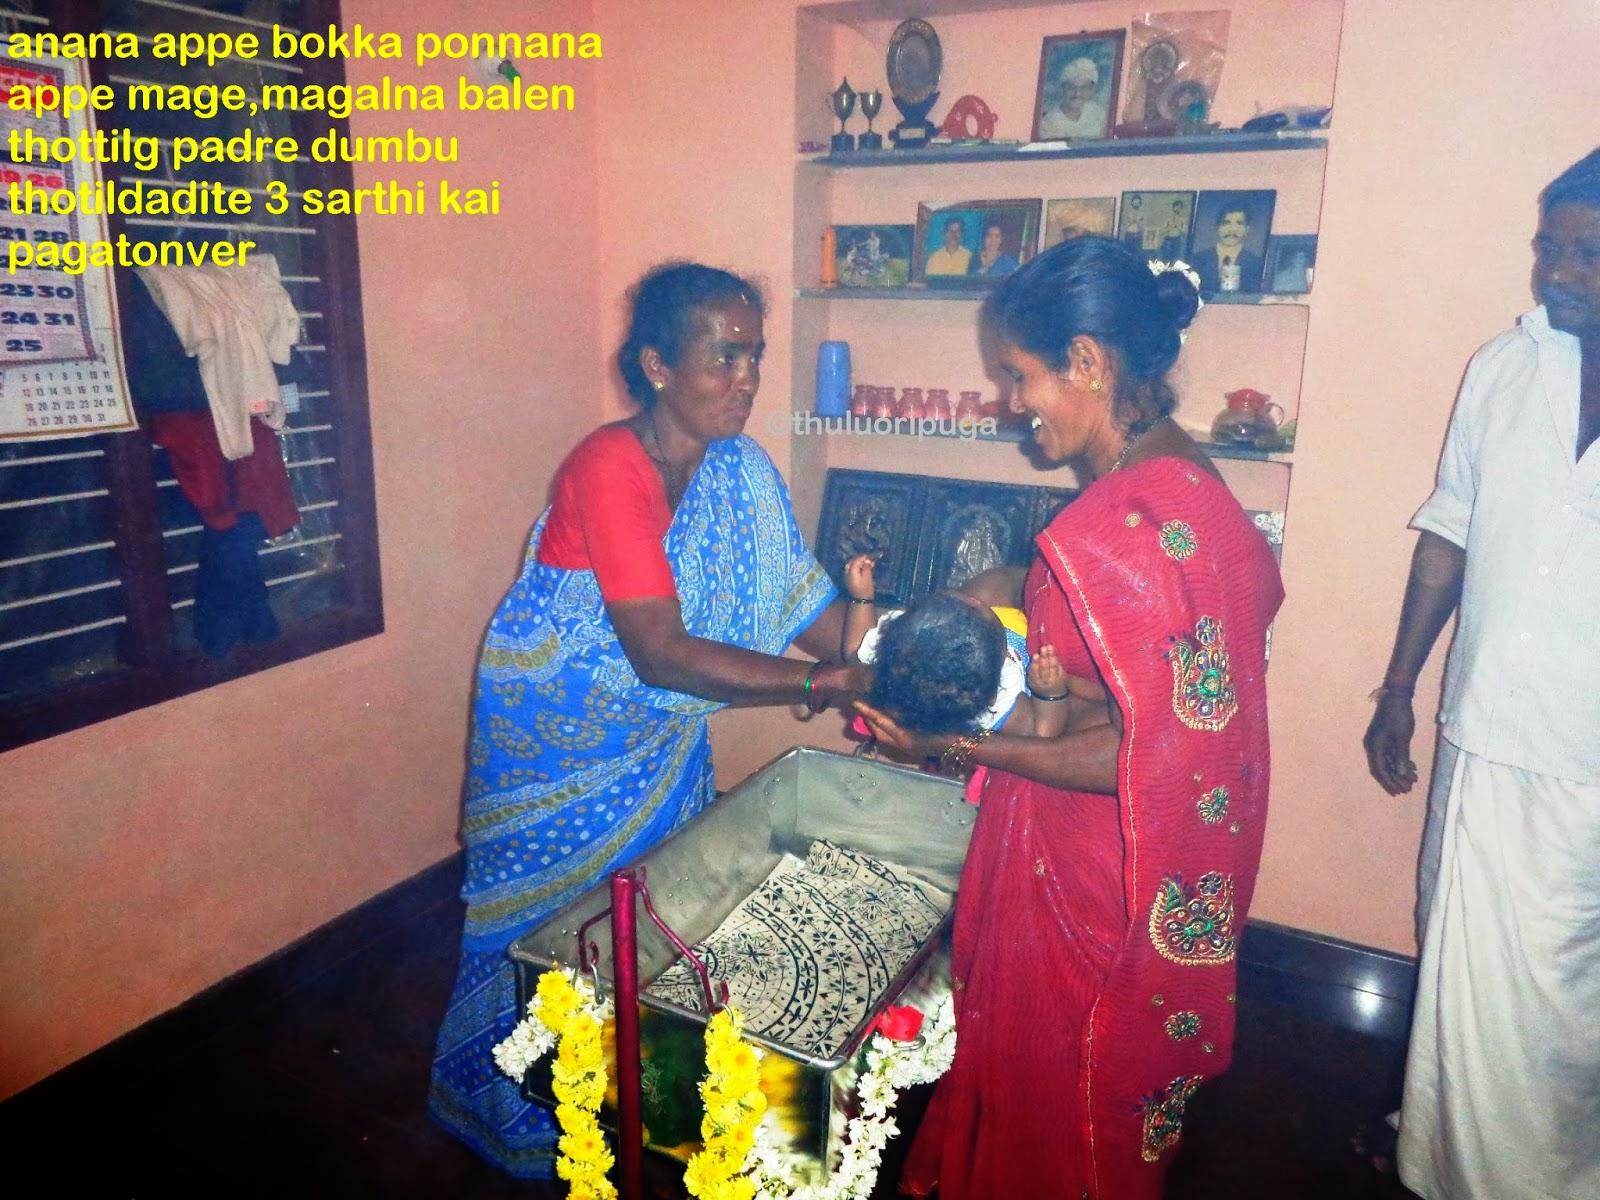 THULU ORIPUGA-kavyasutha : December 2013